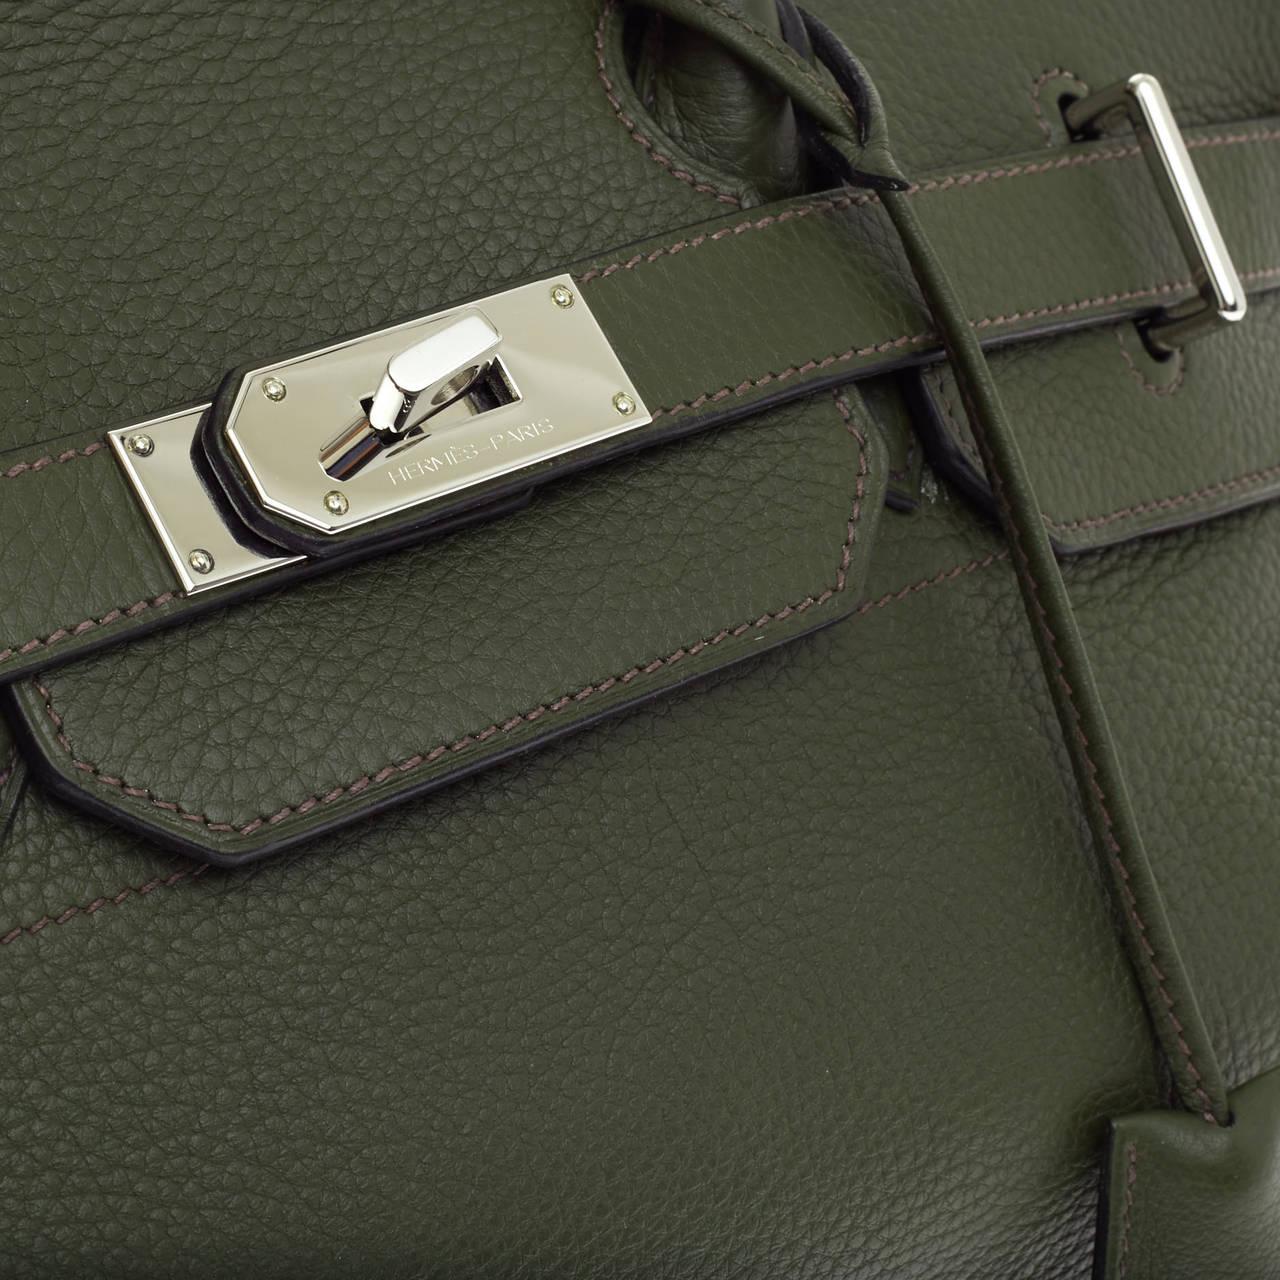 hermes bag sale - Hermes Birkin JPG Vert Olive Clemence with Palladium Hardware 42 ...